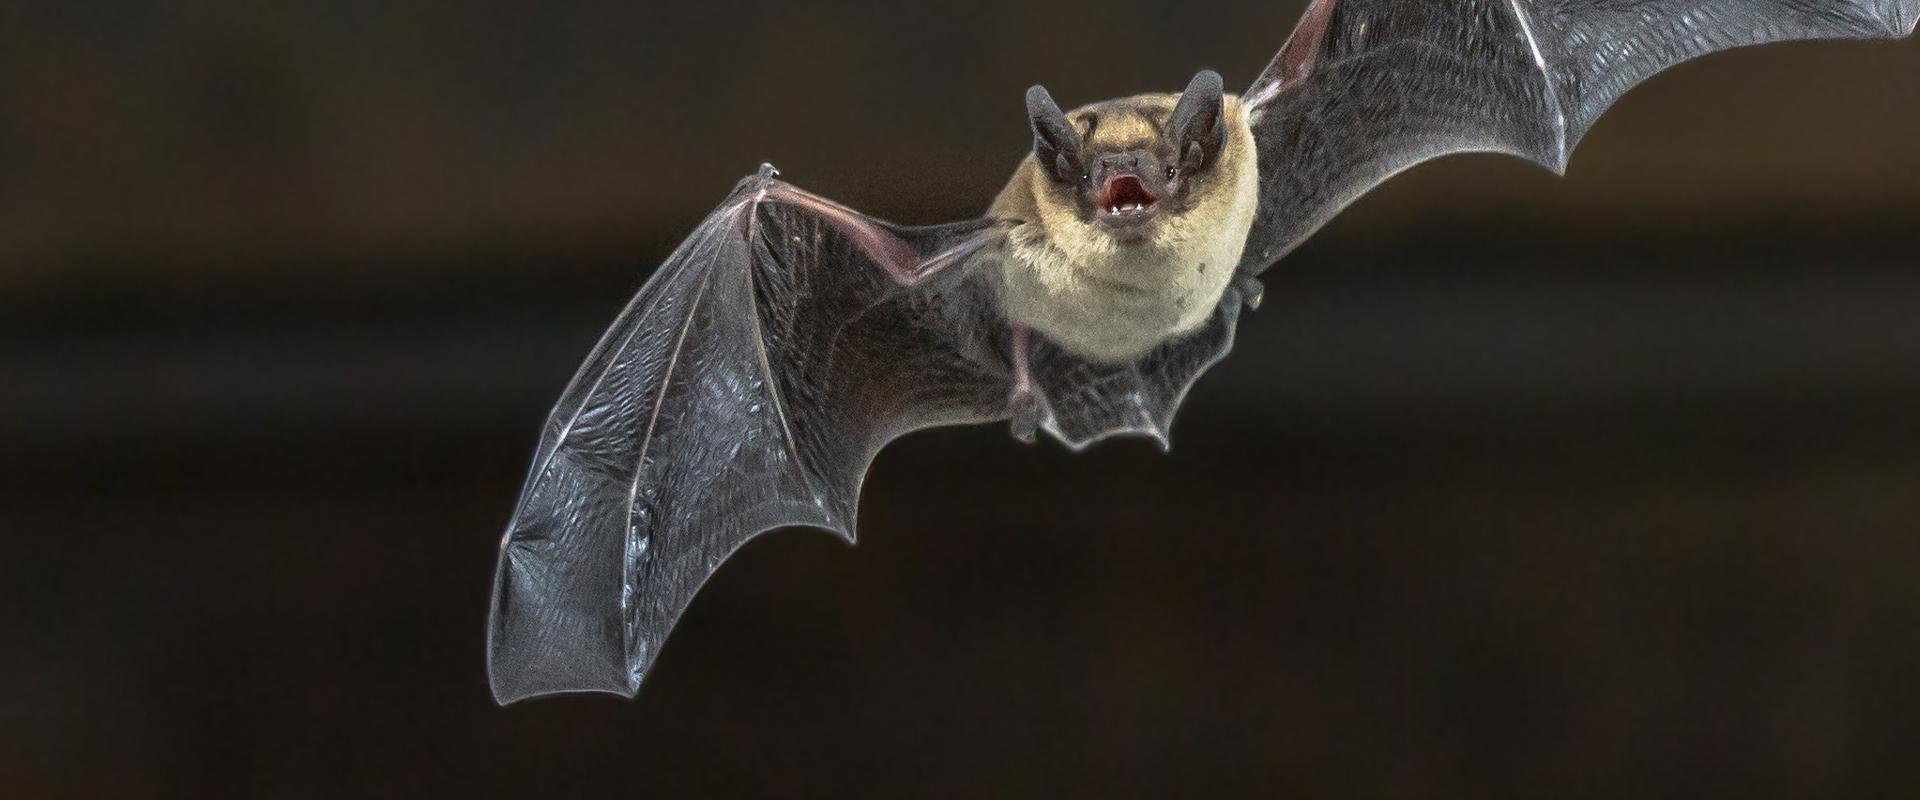 bat flying through the air